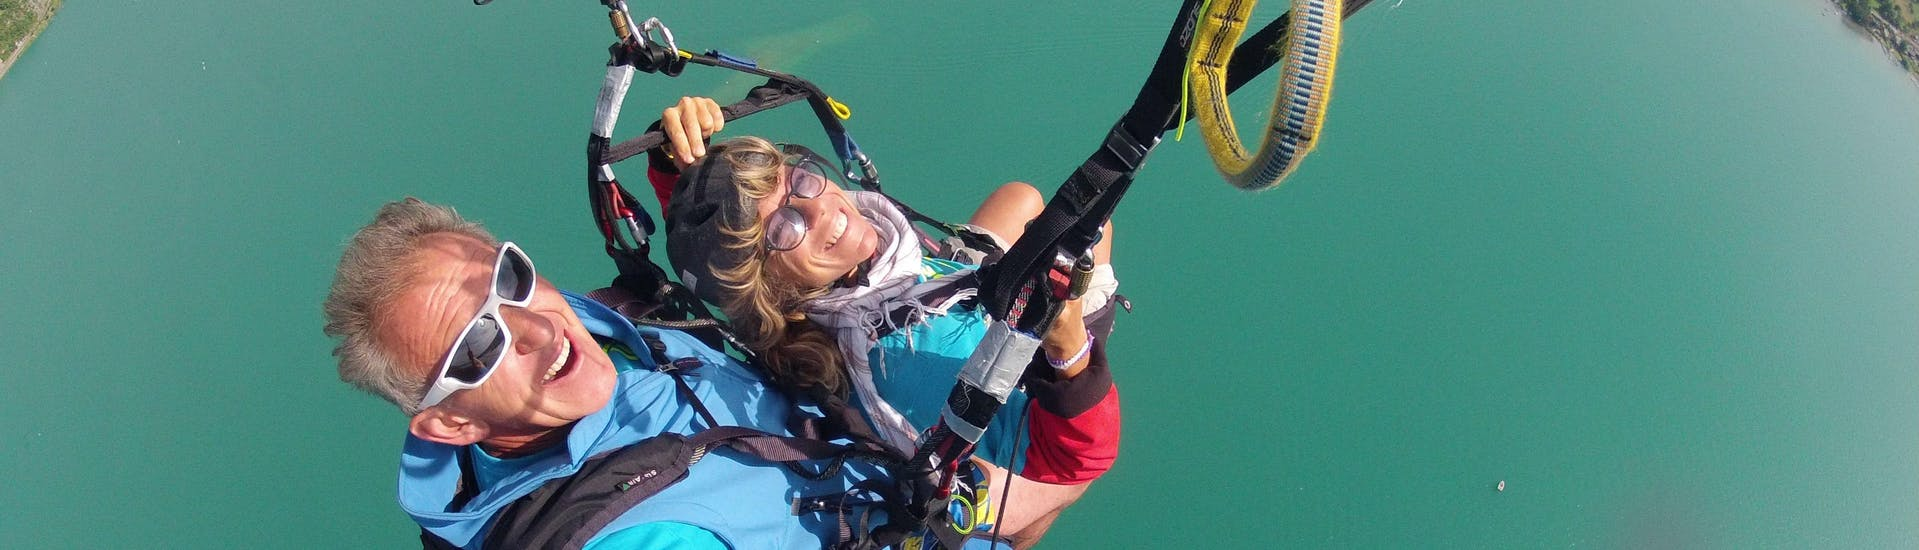 A woman is enjoying her paragliding flight with FBI Parapente.